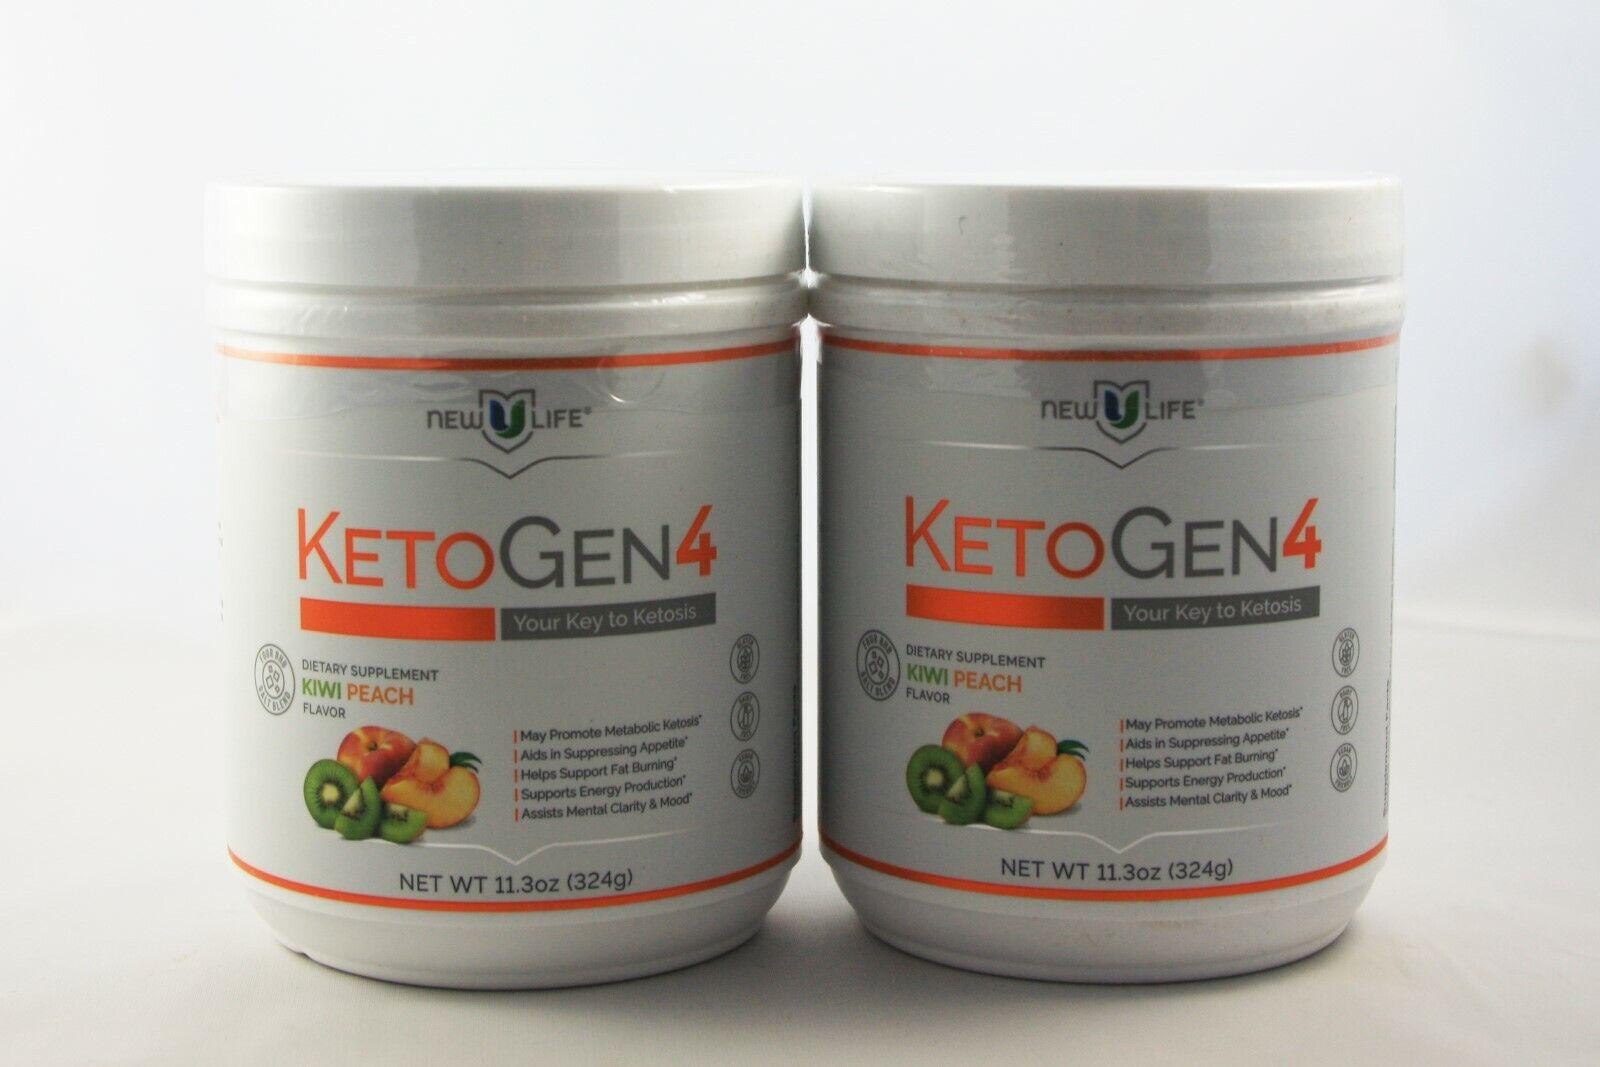 NewULife New U Life KETOGEN4 Kiwi Peach Flavor Keto Ketosis 2-PACK